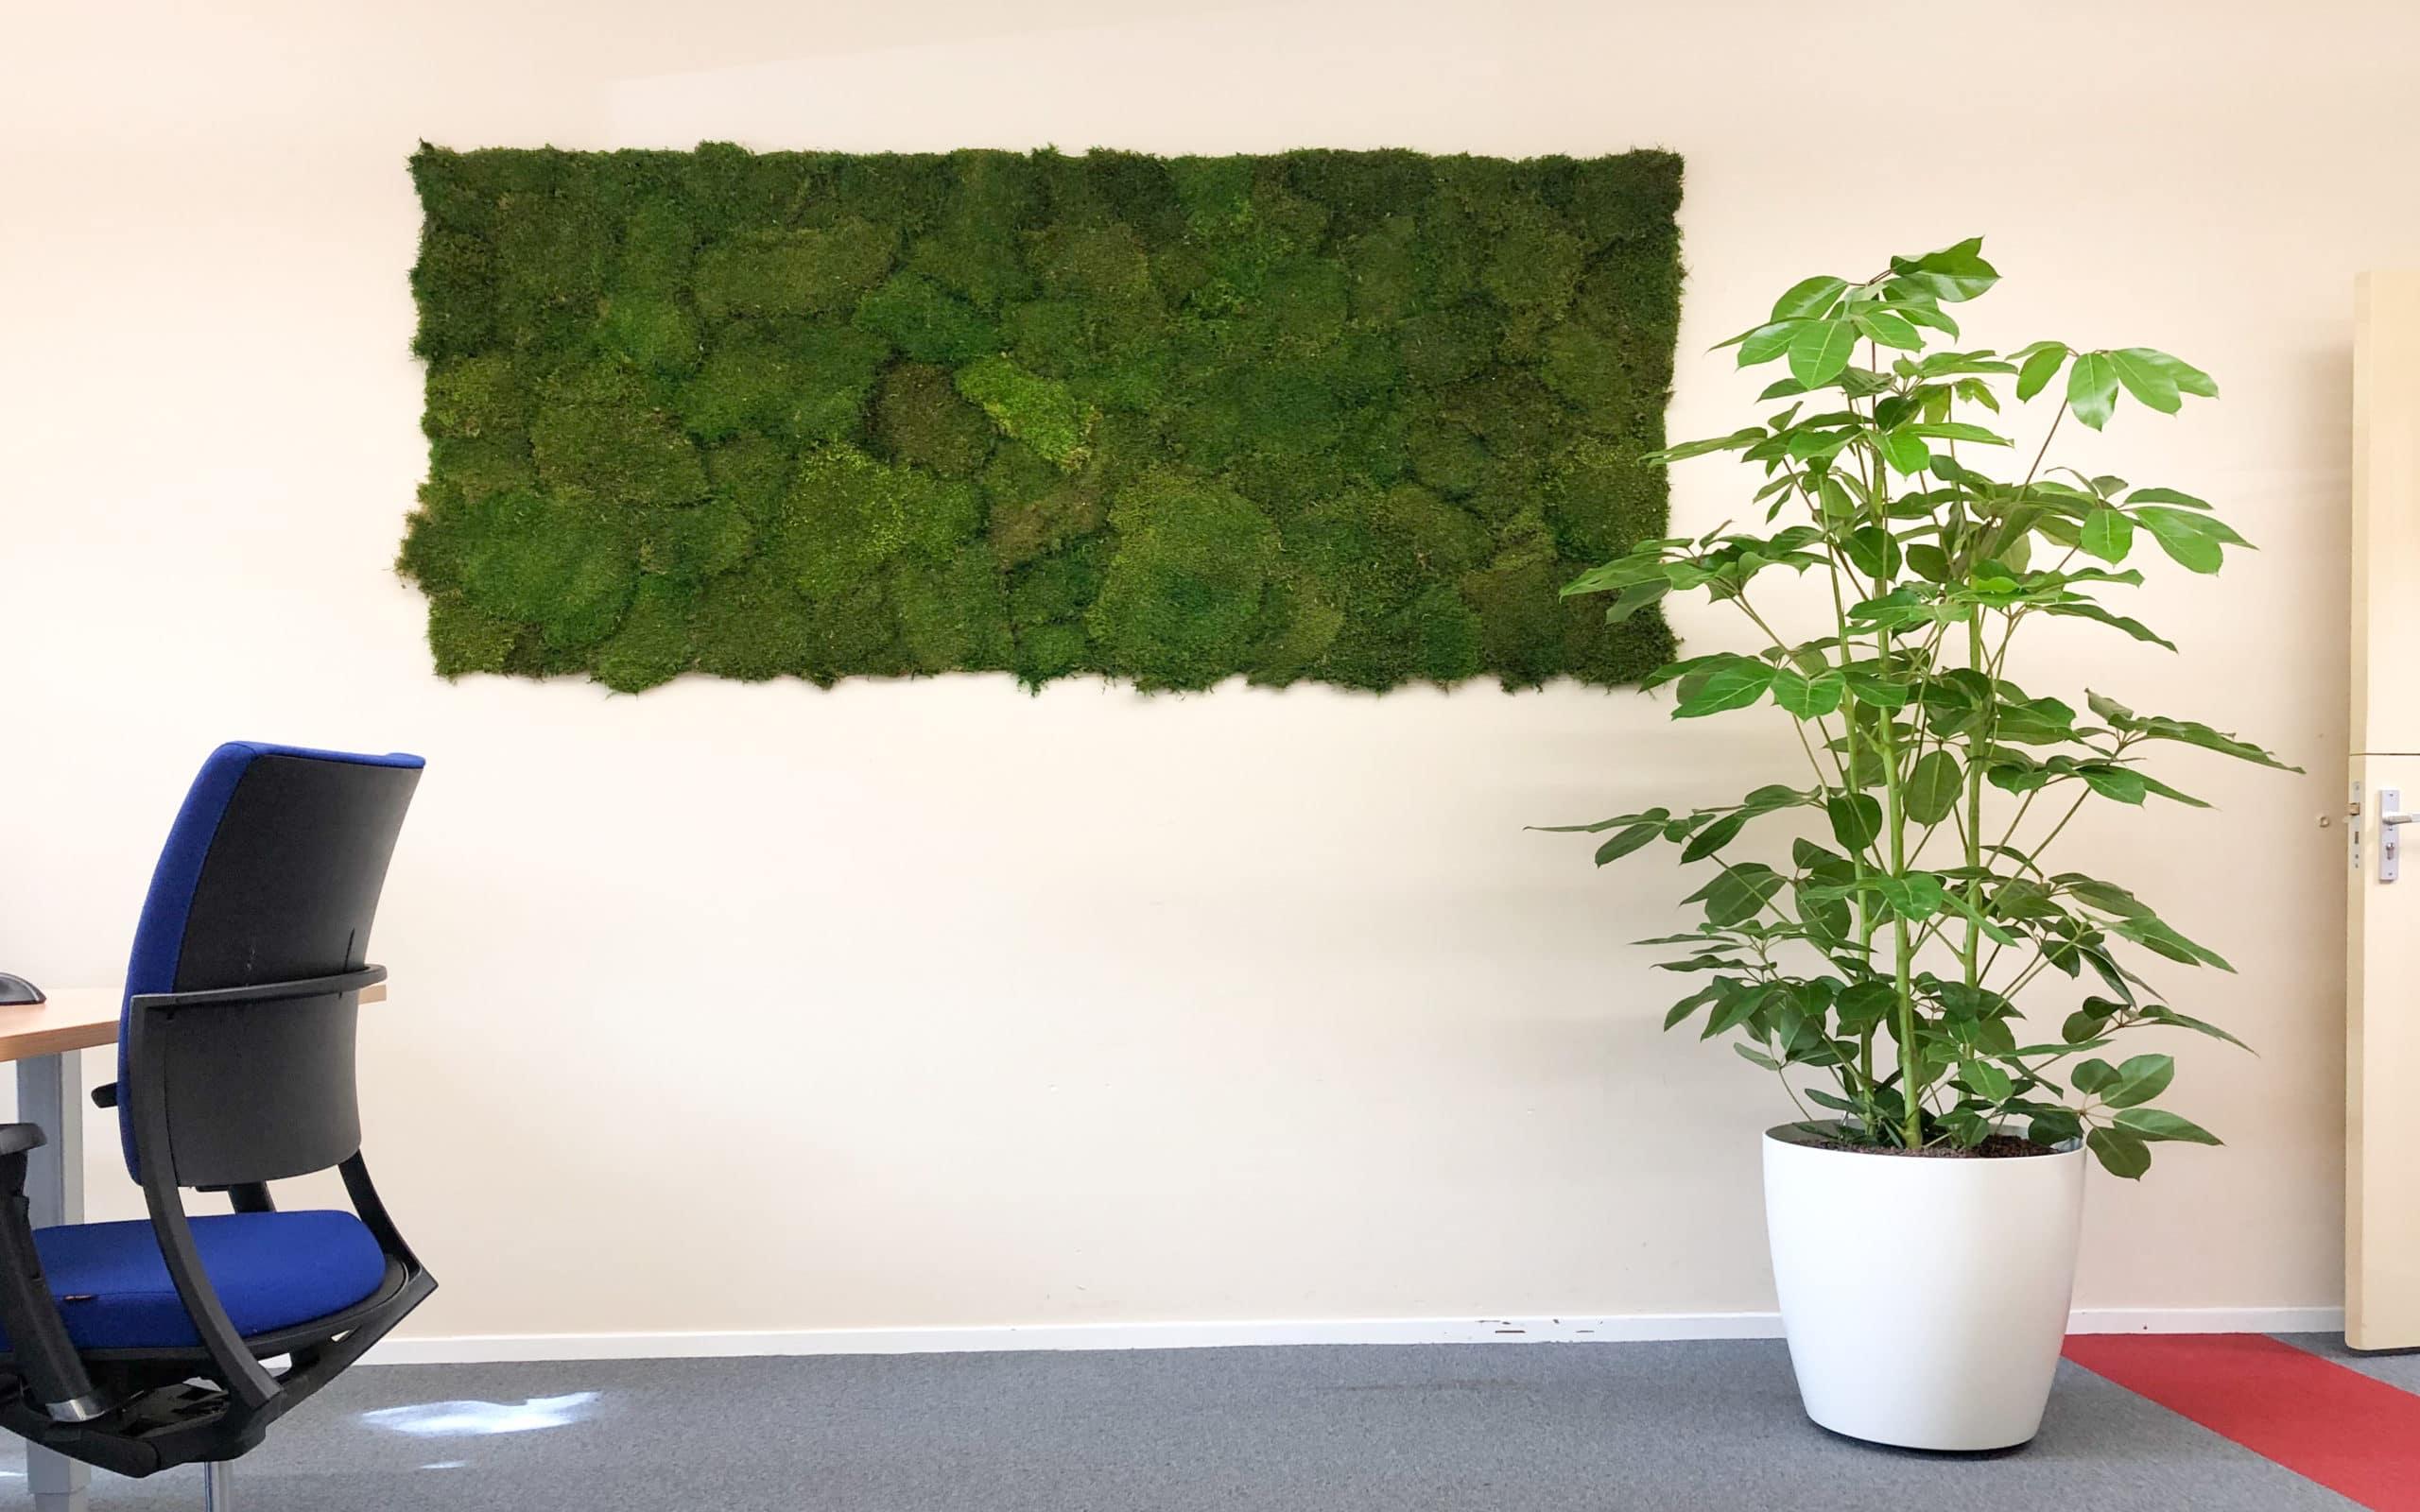 Platmos moswand bij Eskes media groene wand